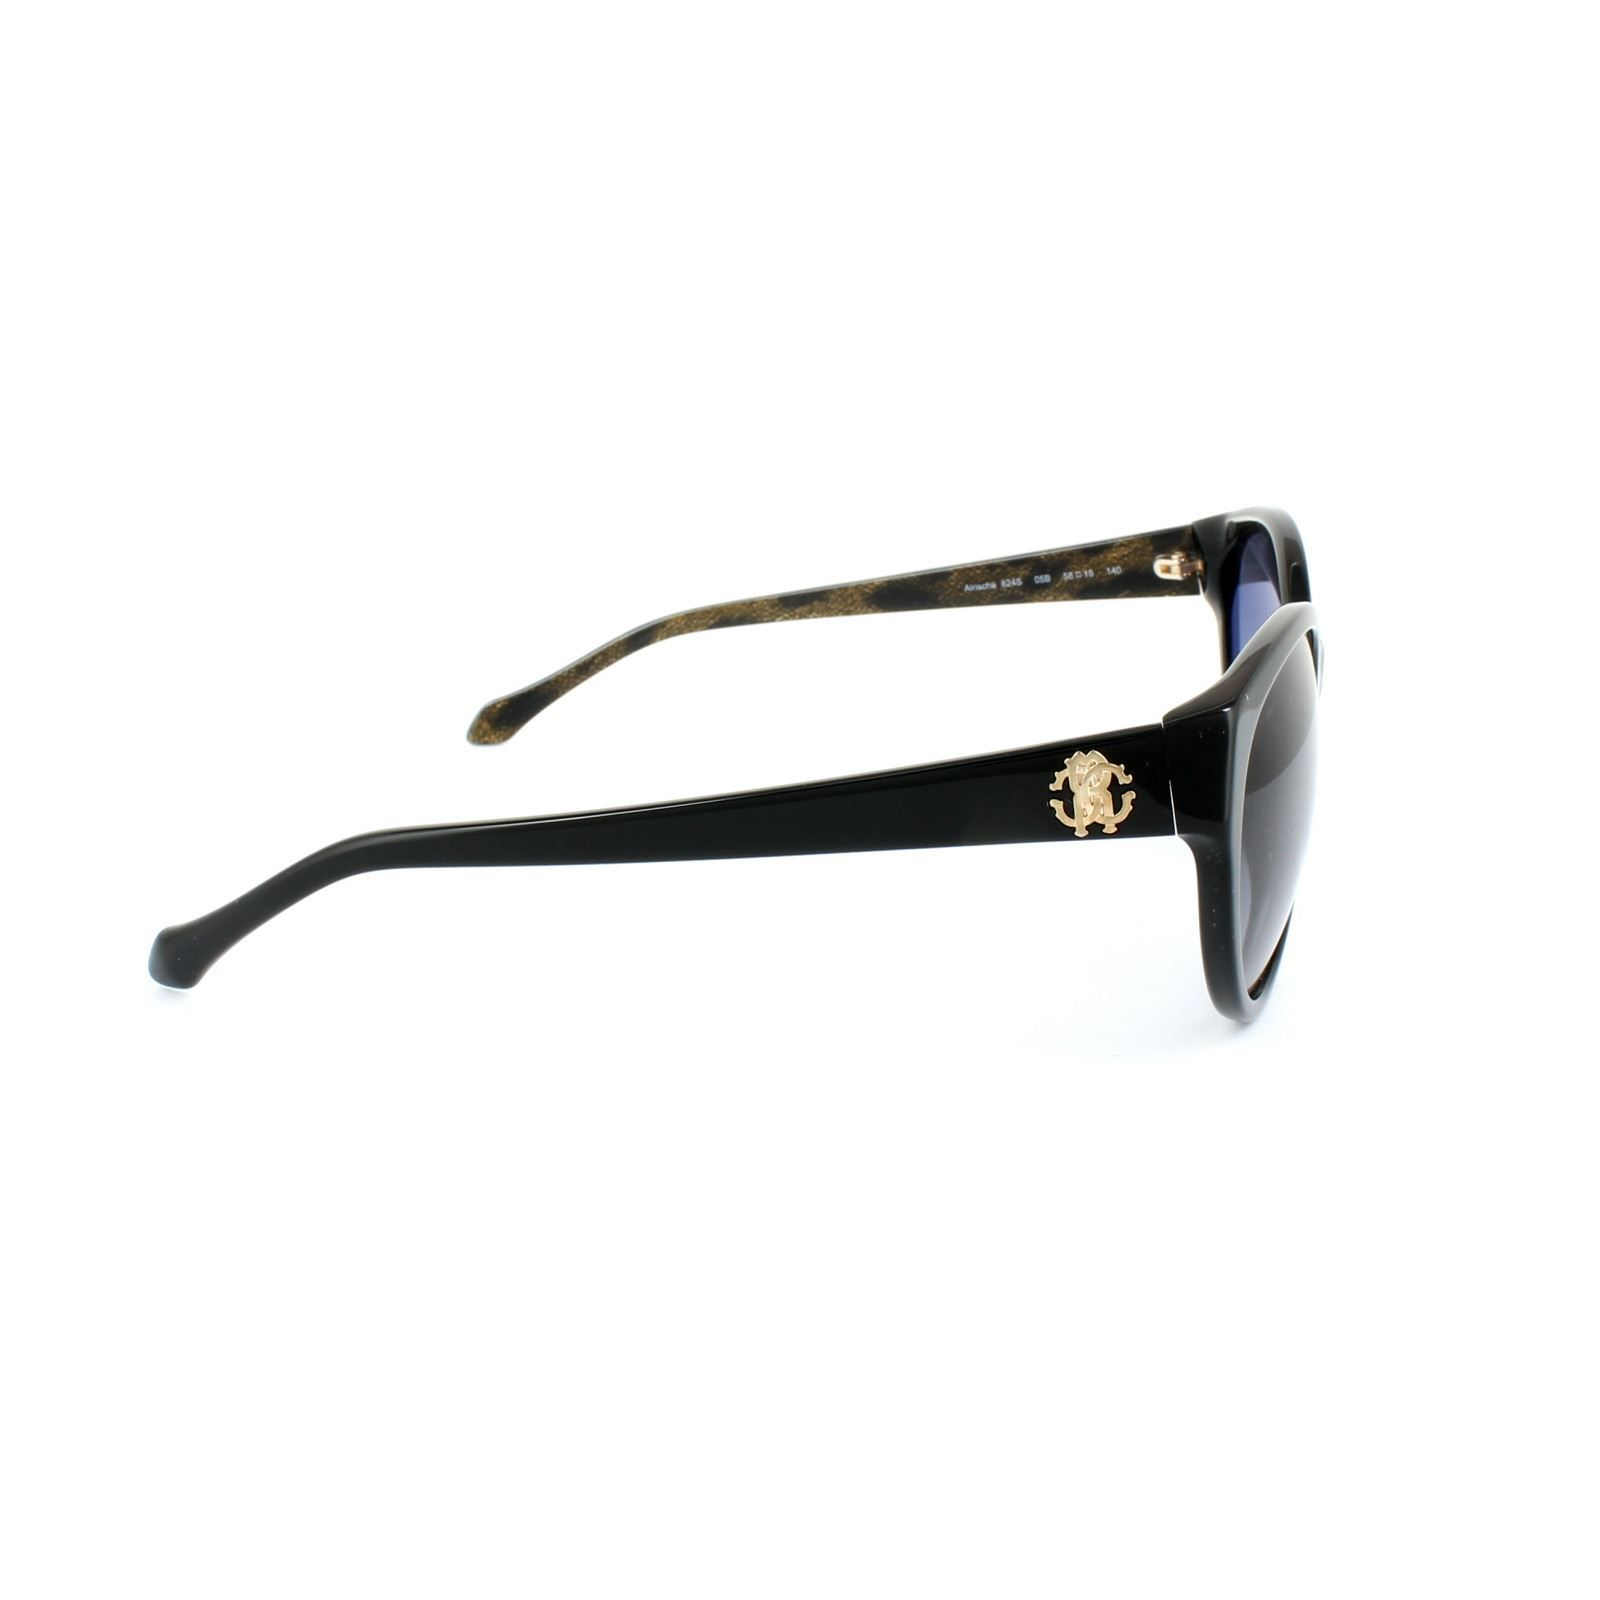 Roberto Cavalli Sunglasses Alrischa 824 05B Shiny Black Grey Gradient